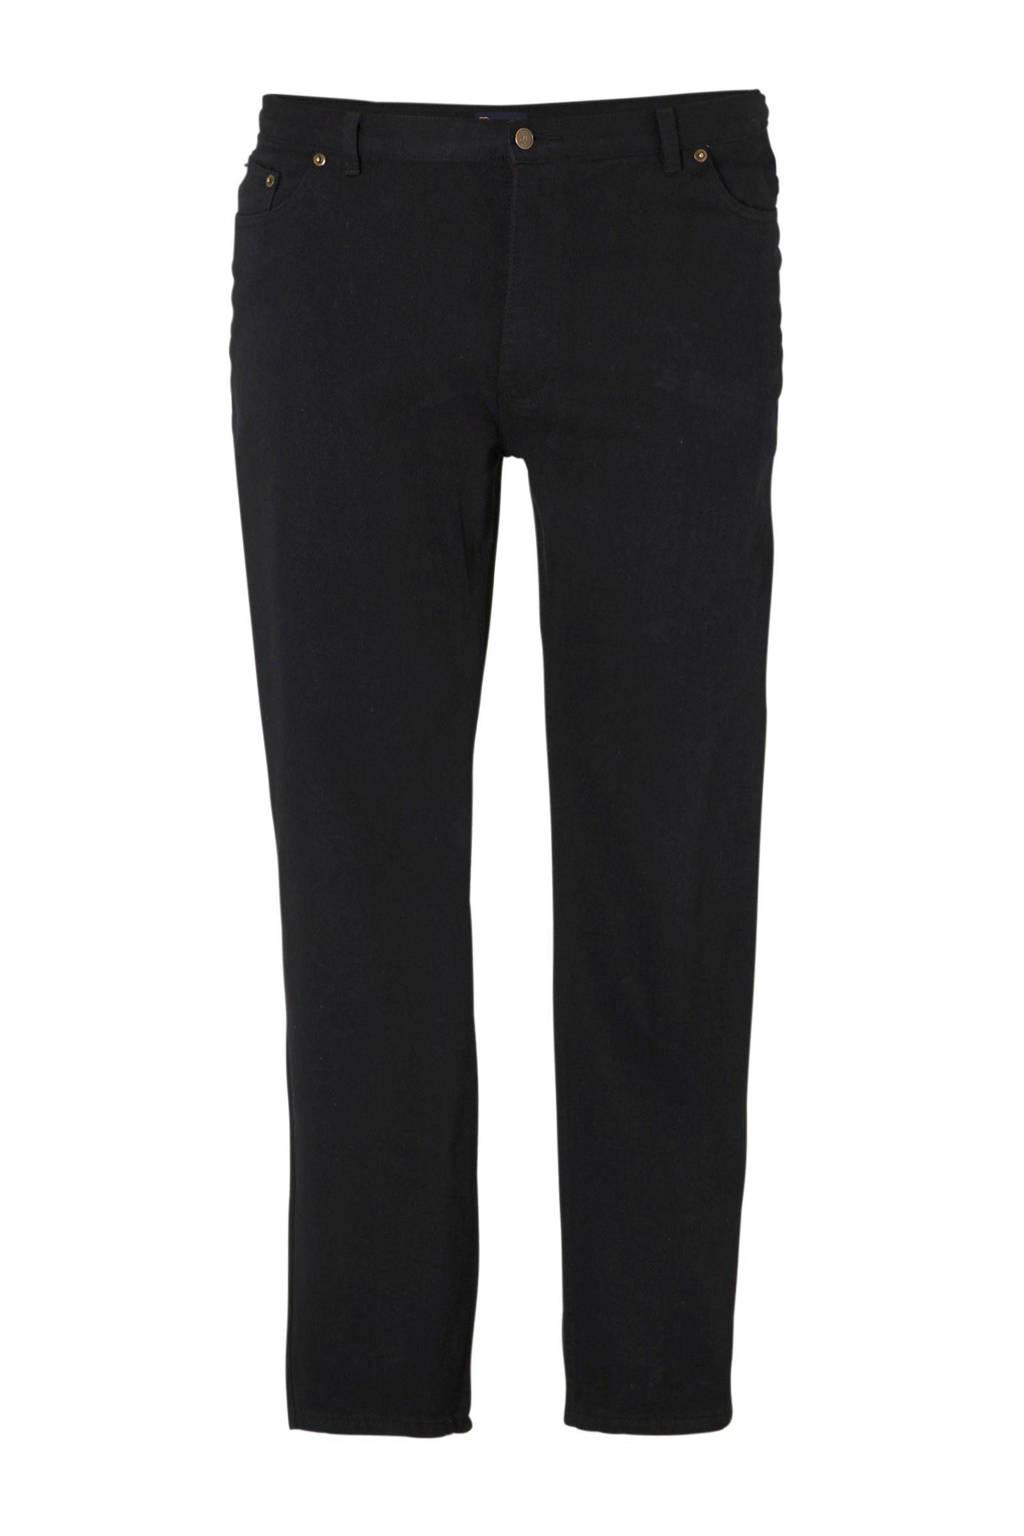 Rockford +size loose fit comfort jeans, Zwart